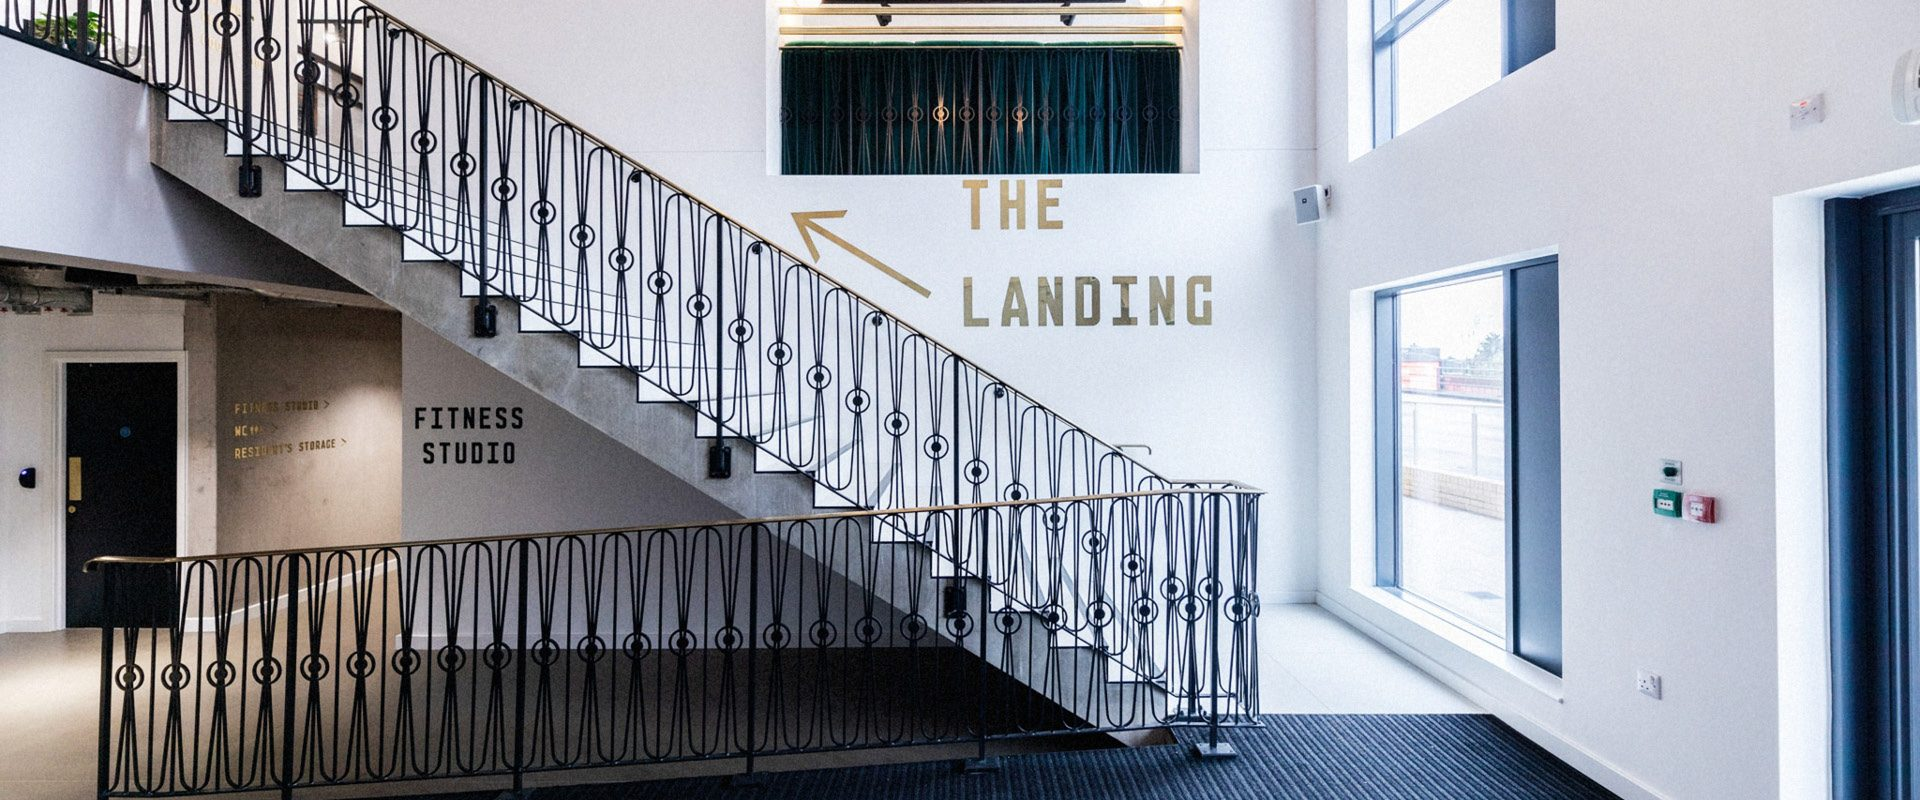 The Lansdowne - Way of Life - Entrance hall